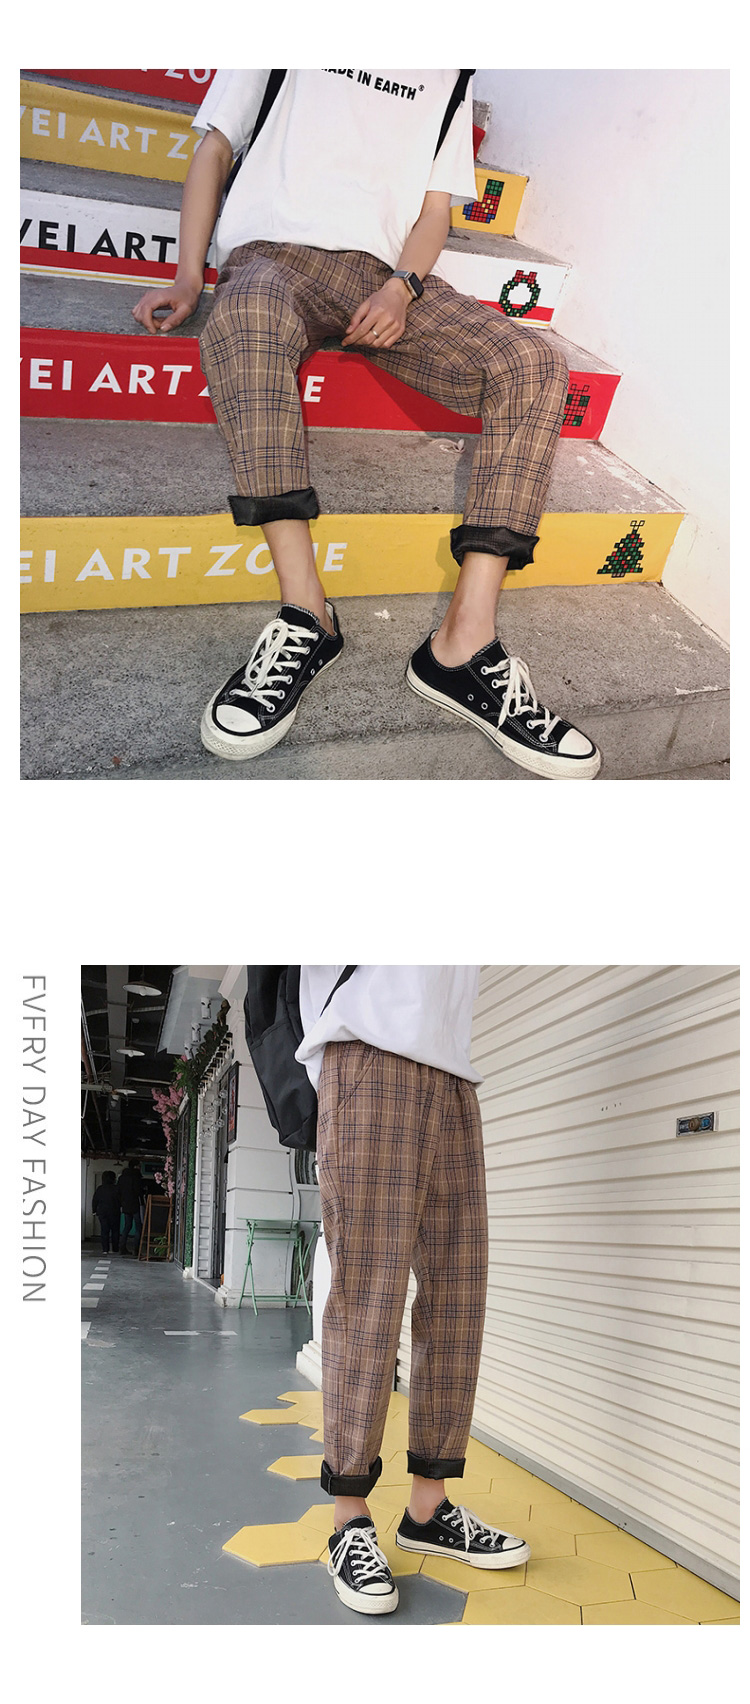 HTB1pEKjbE rK1Rjy0Fcq6zEvVXaC LAPPSTER Streetwear Yellow Plaid Pants Men Joggers 2019 Man Casual Straight Harem Pants Men Korean Hip Hop Track Pants Plus Size